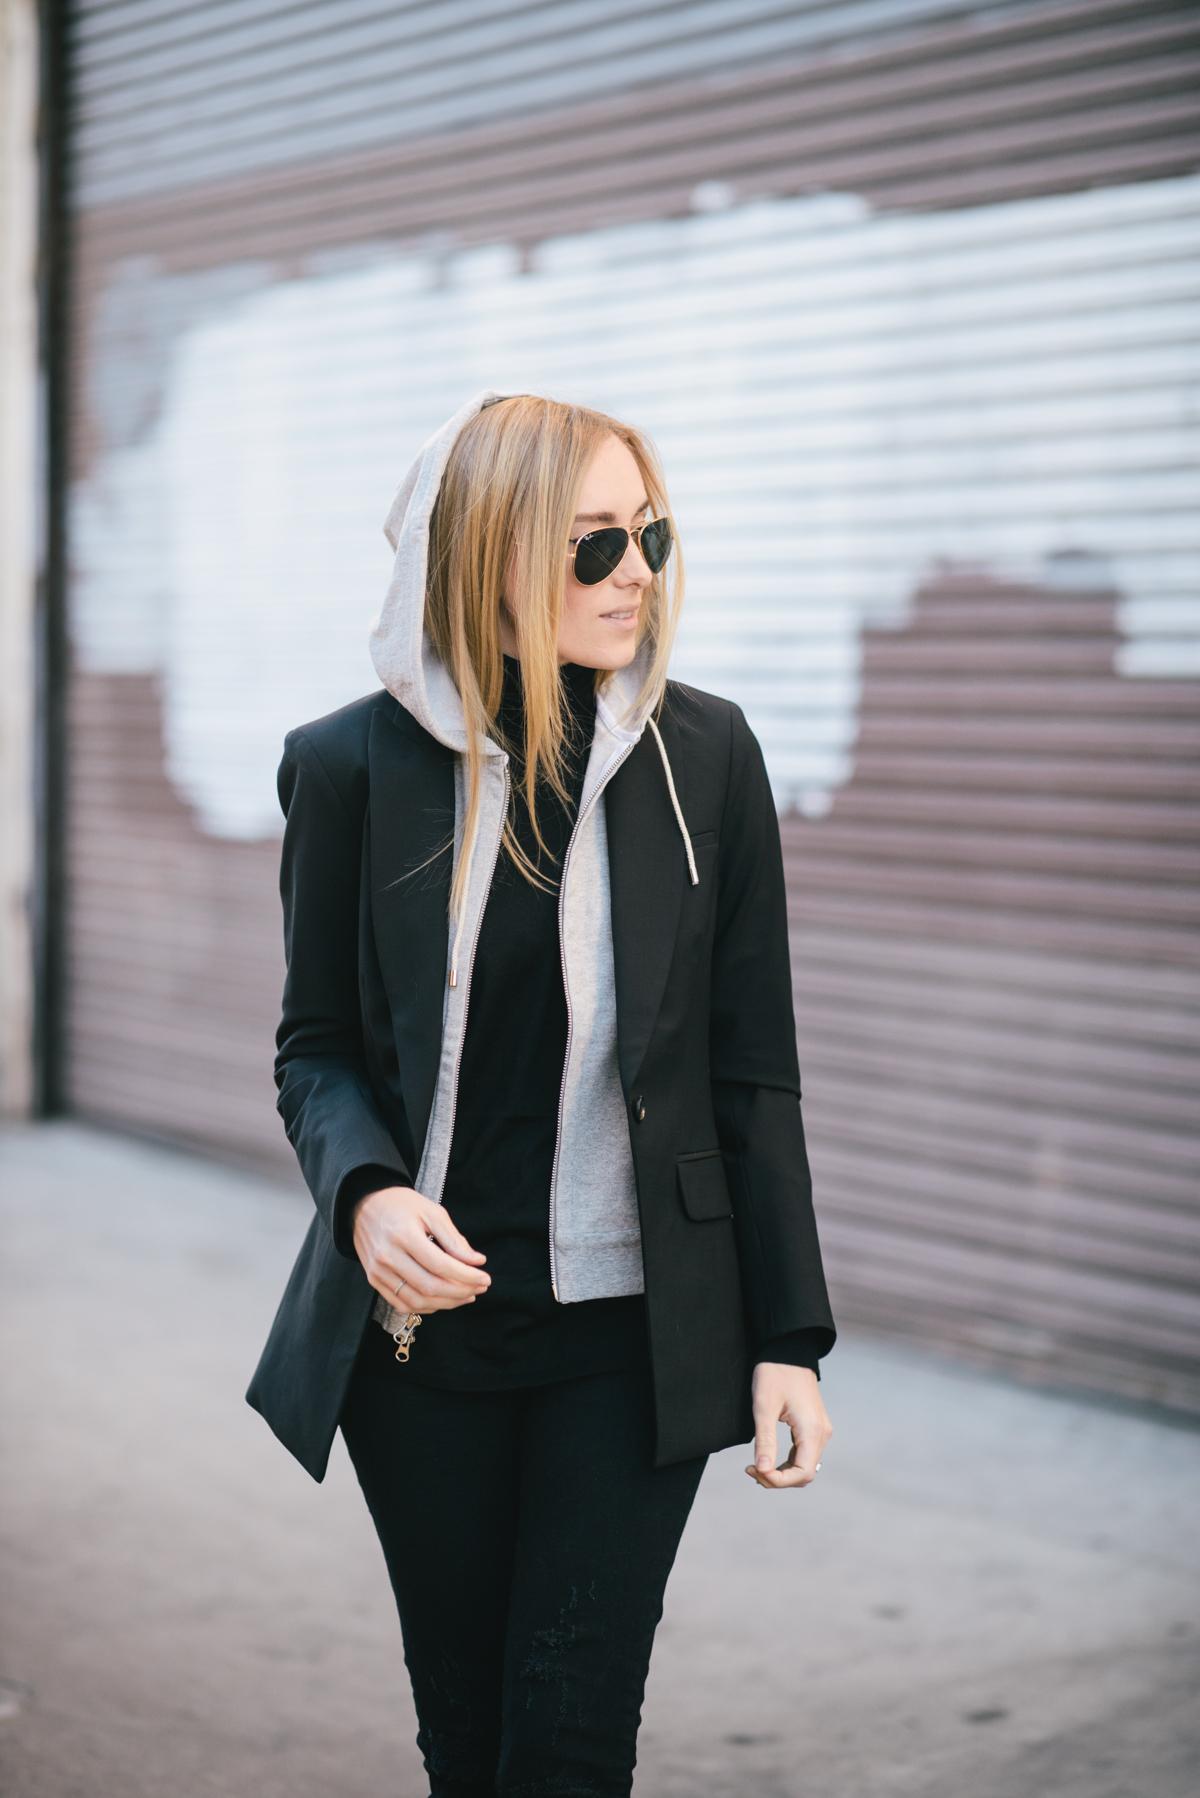 Hoodie Meets Blazer Eat Sleep Wear Fashion Amp Lifestyle Blog By Kimberly Pesch